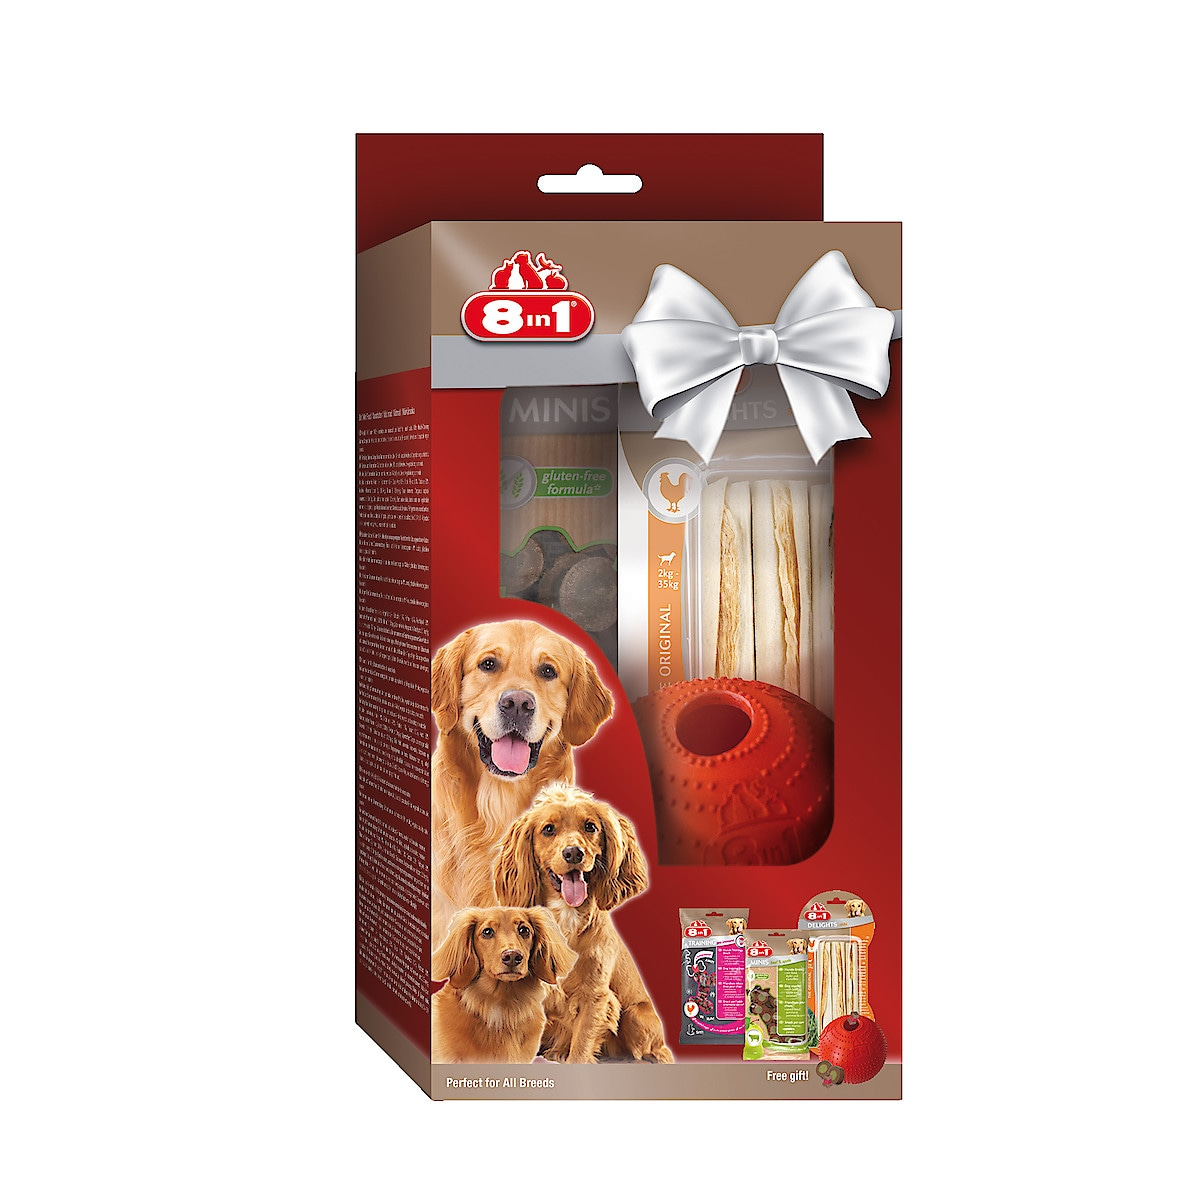 8in1 Dog Gift Box